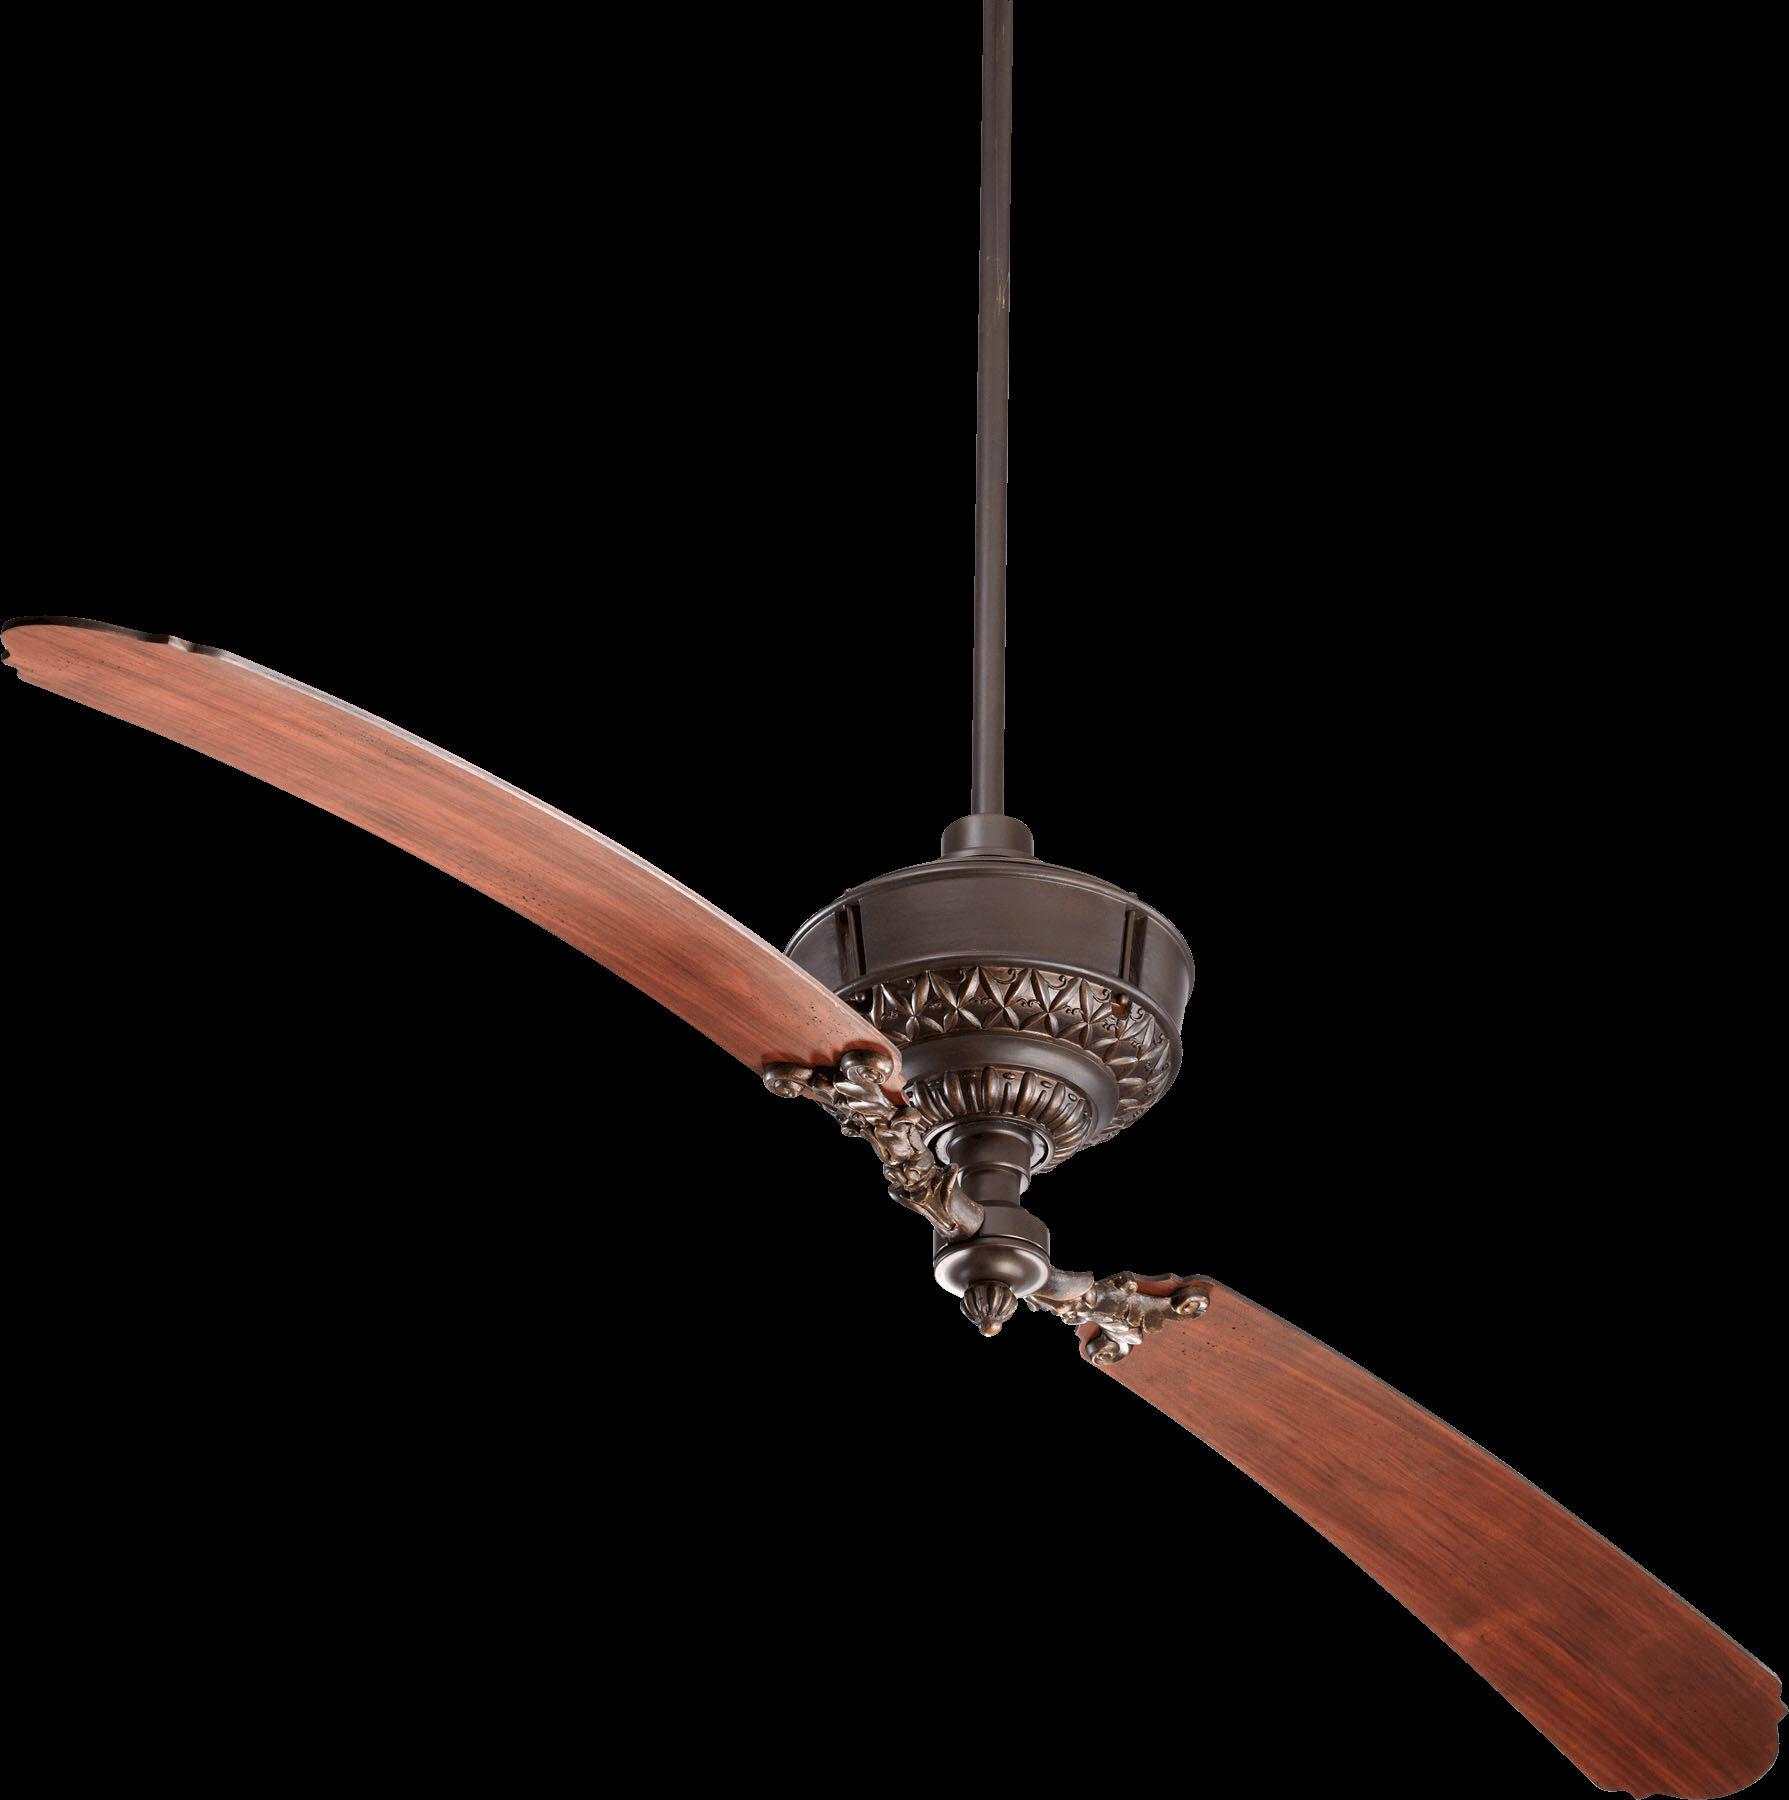 Quorum 68 turner 2 blade ceiling fan wayfair aloadofball Images